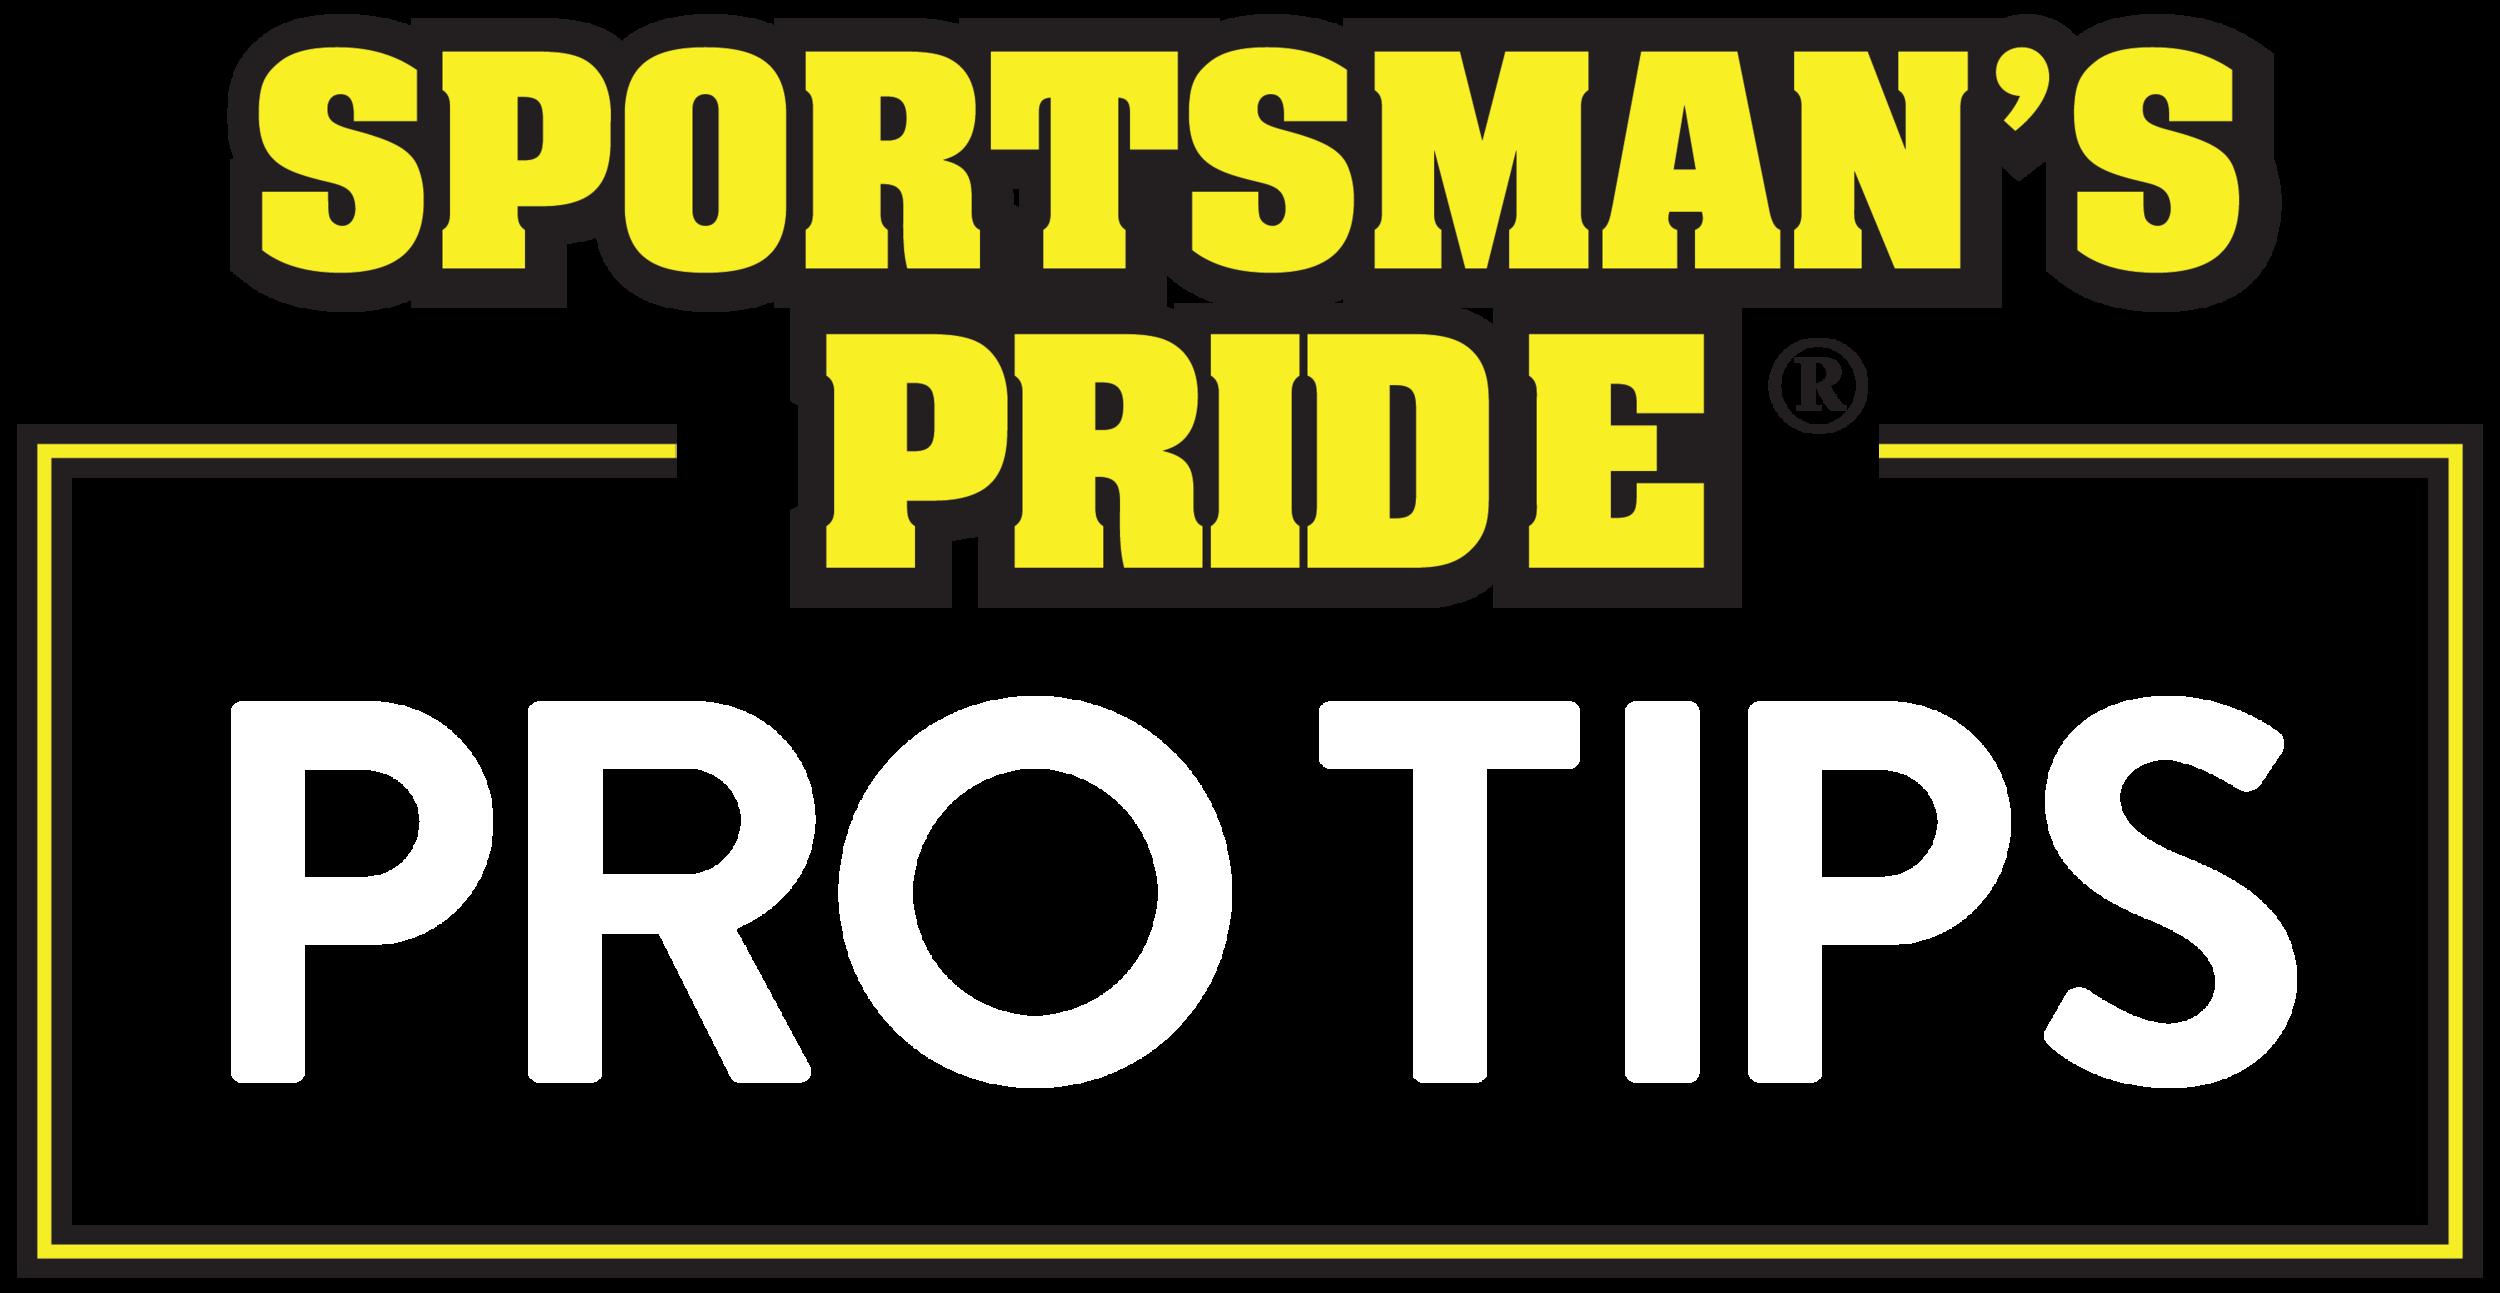 SPORTMANSPRIDE_Pro Tips_logo-final_white-01.png